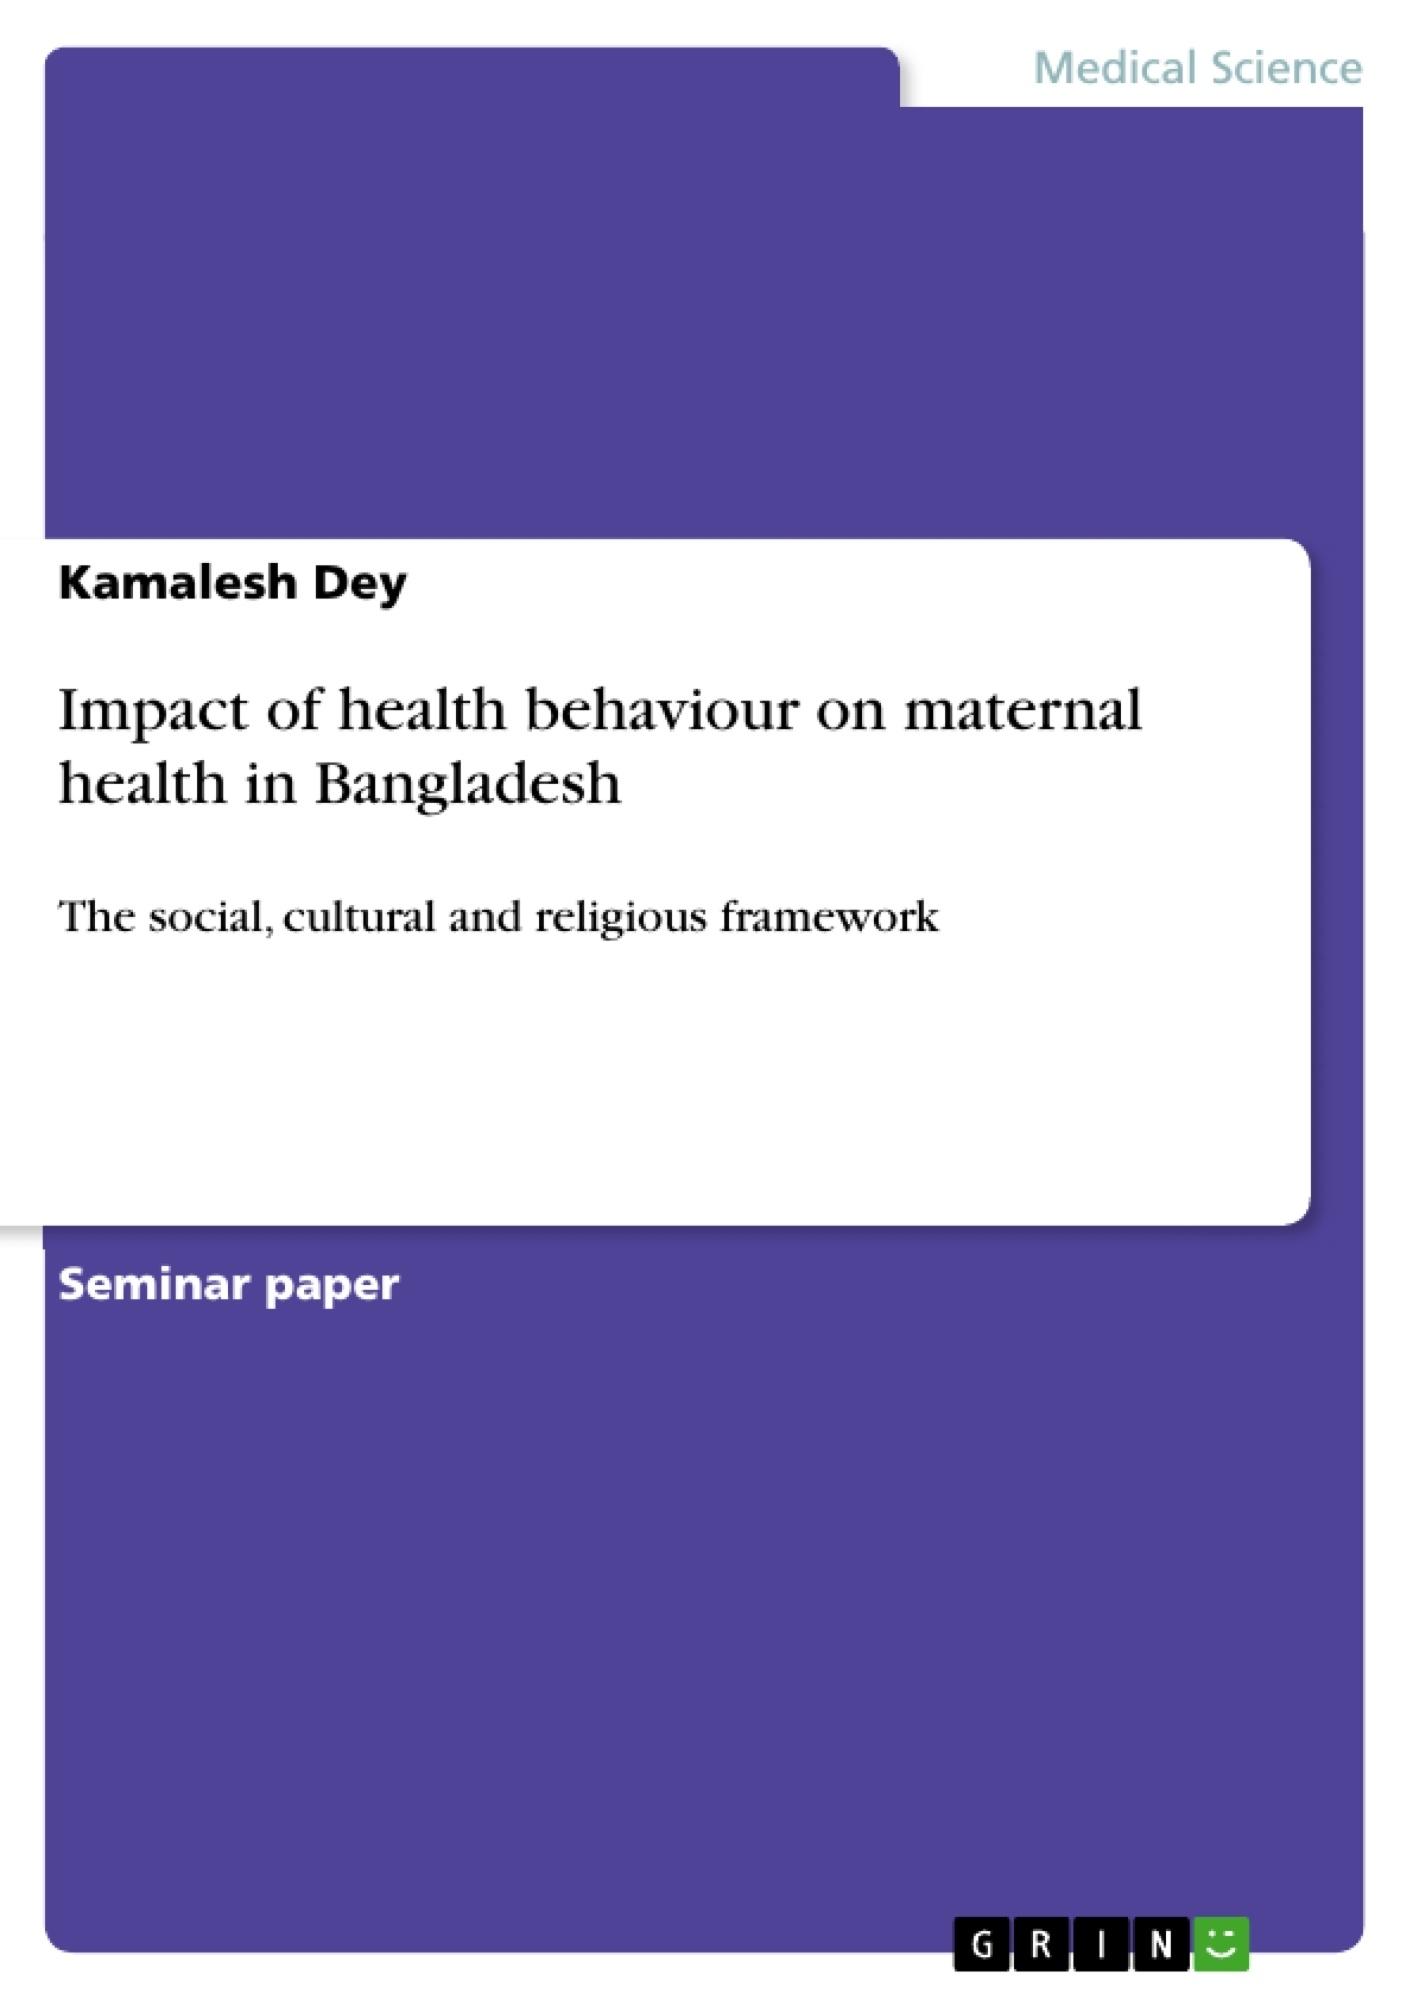 Title: Impact of health behaviour on maternal health in Bangladesh